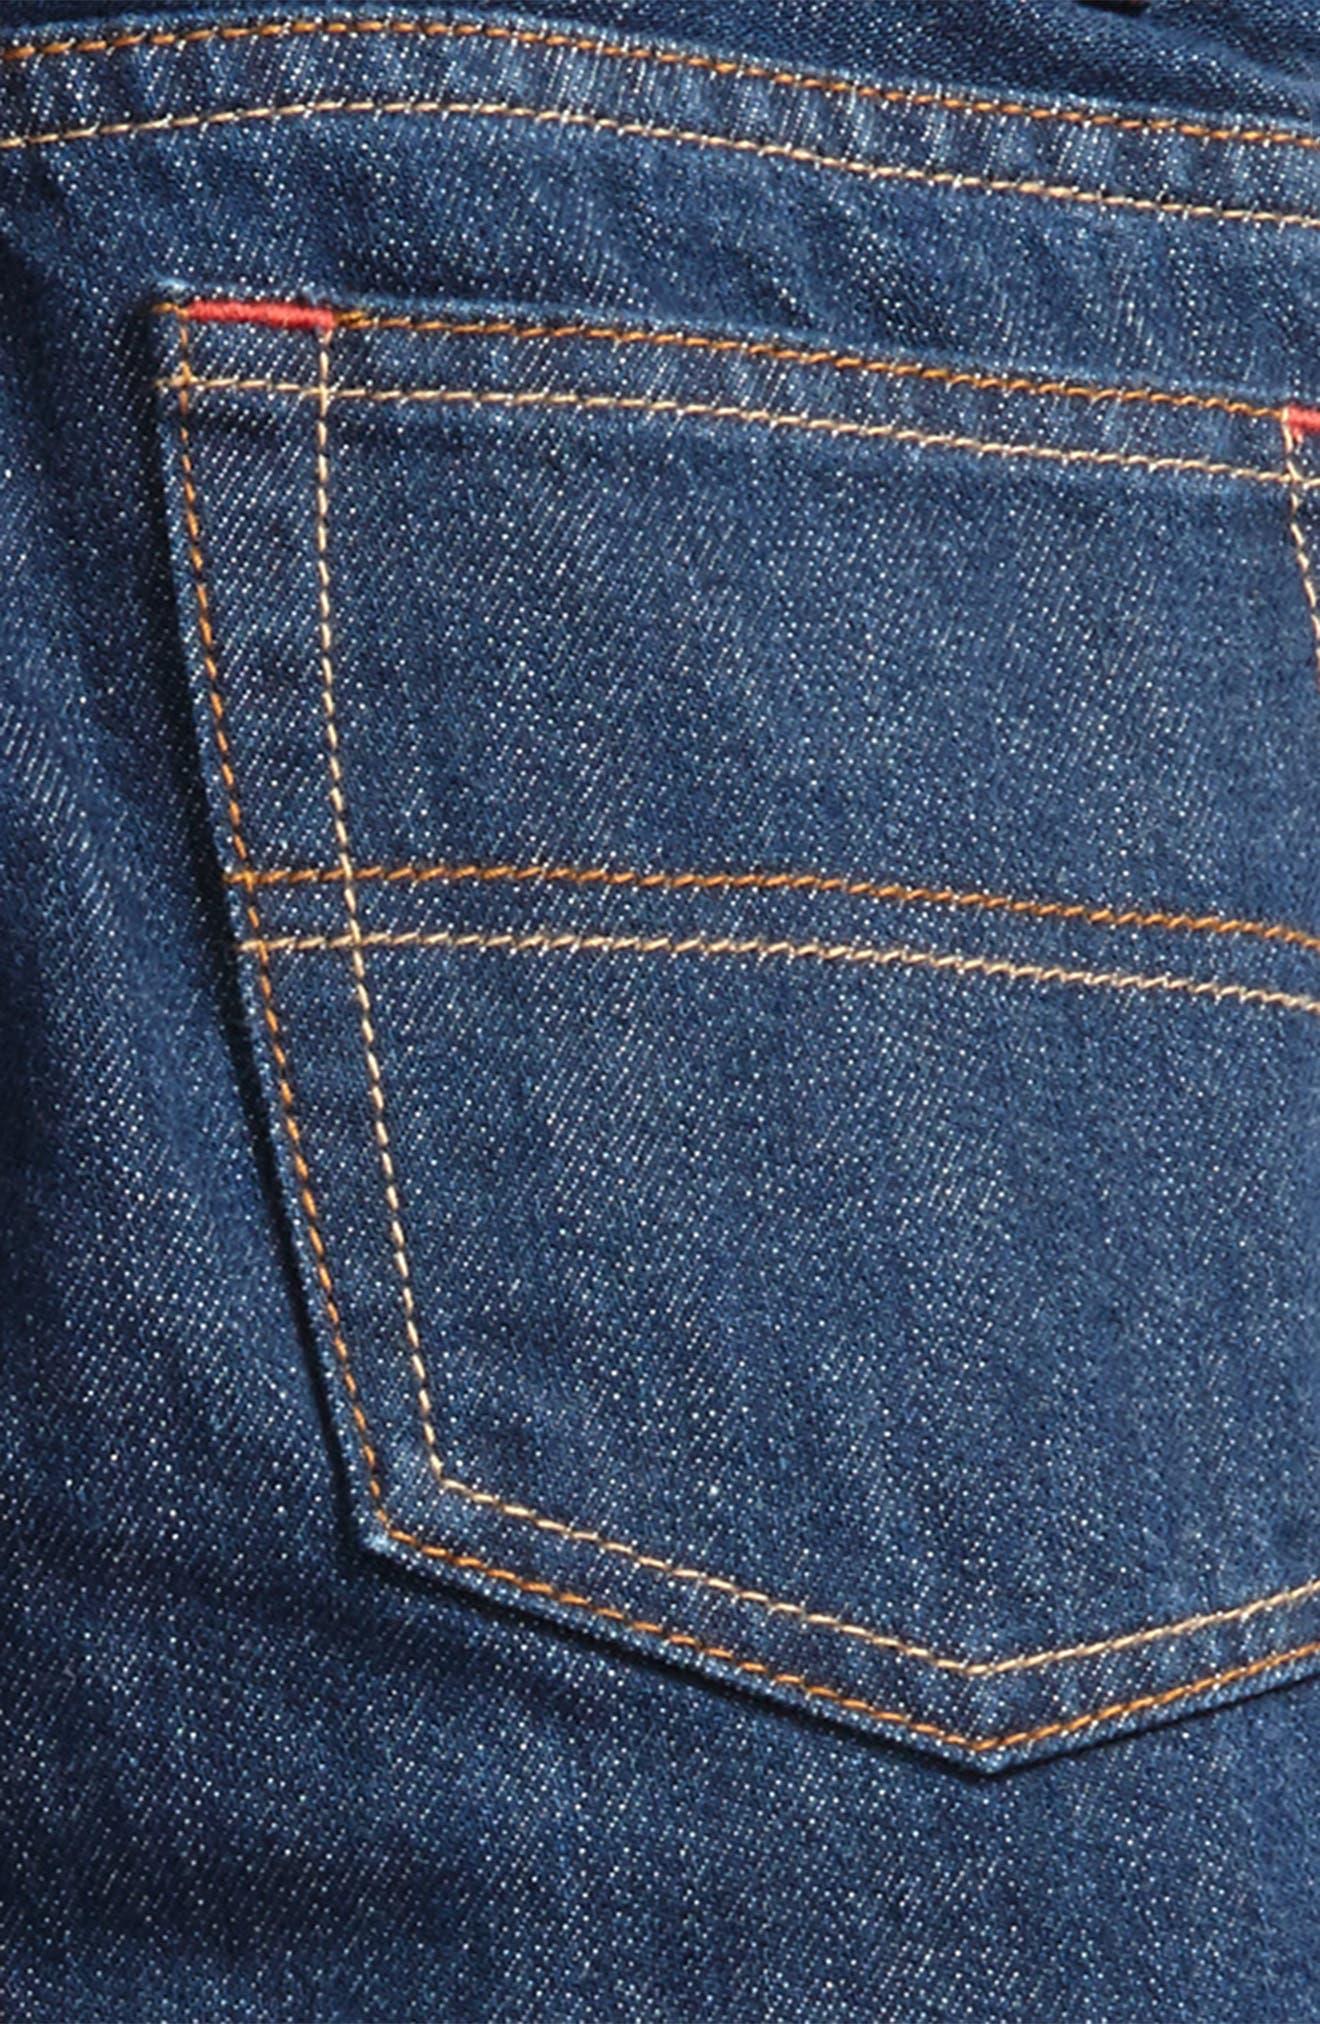 Straight Leg Jeans,                             Alternate thumbnail 3, color,                             404